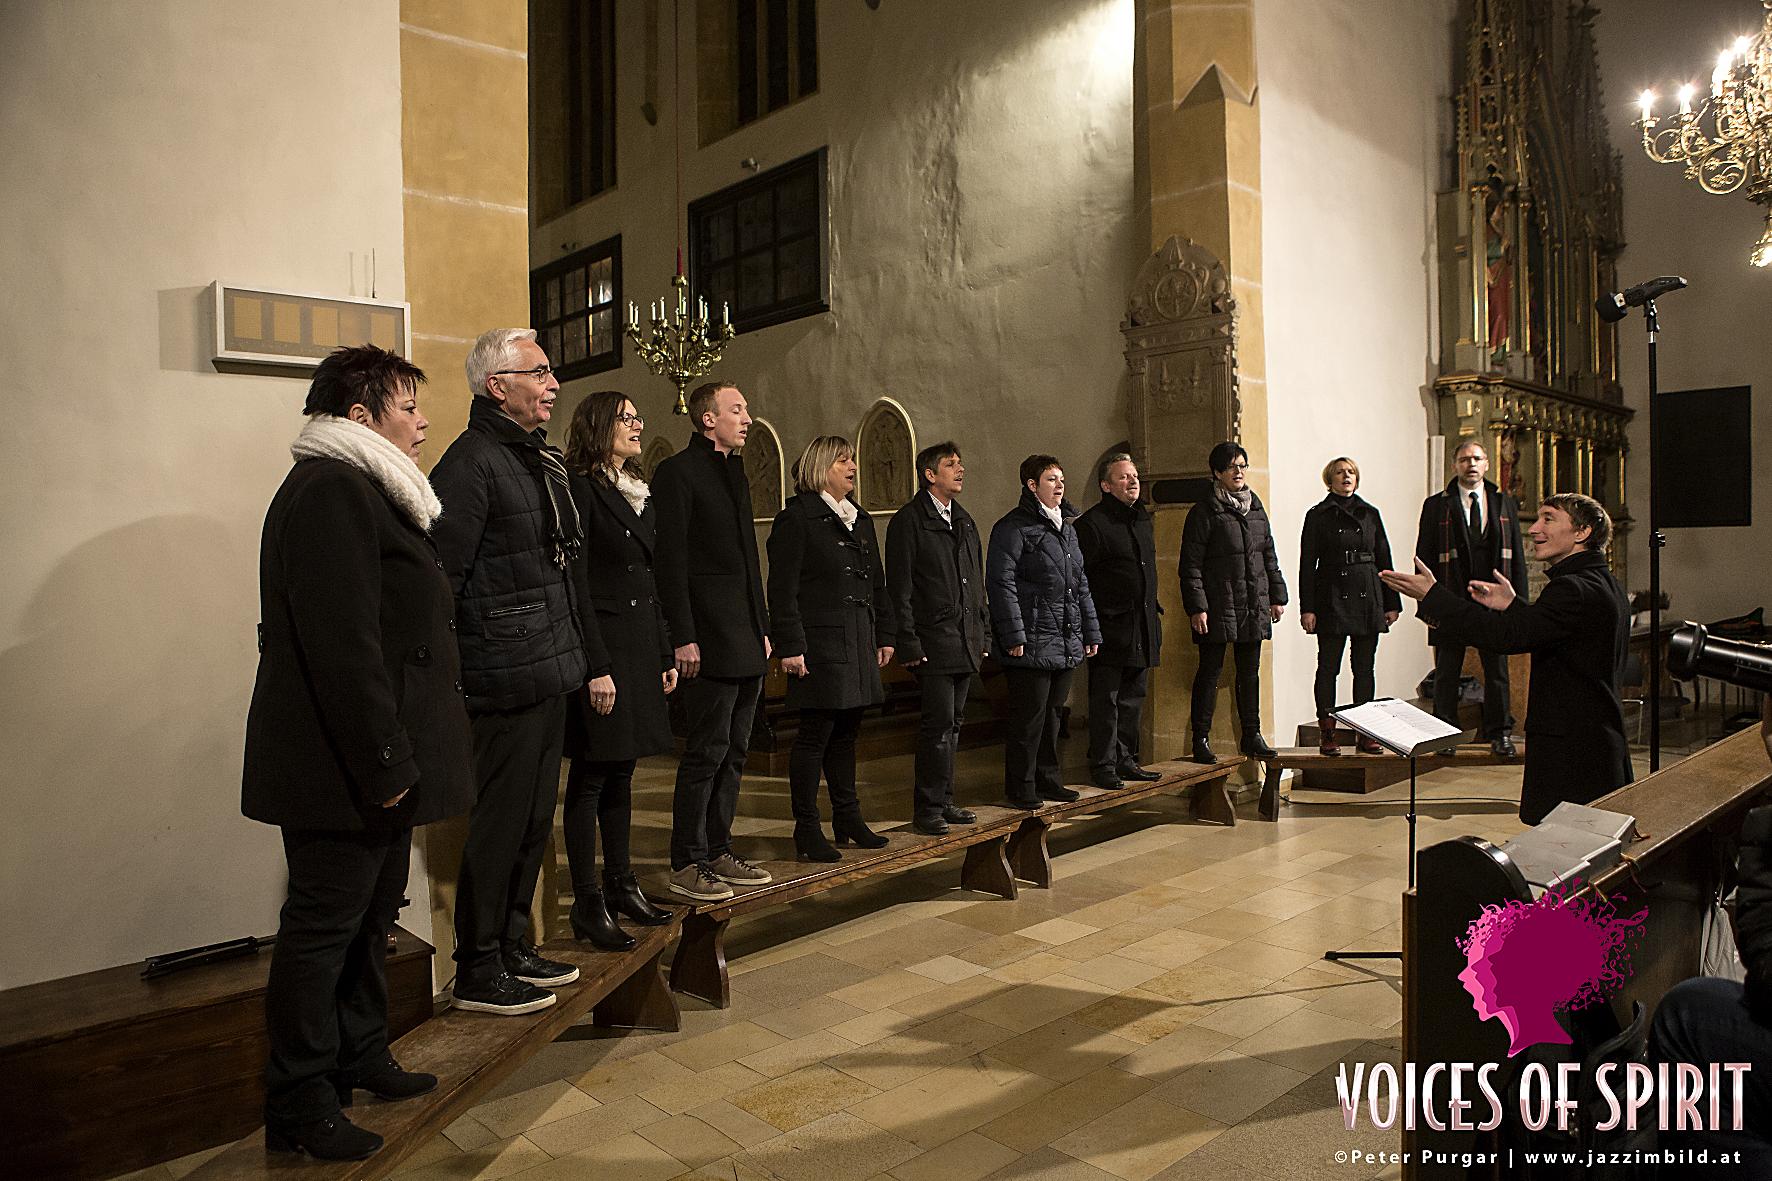 Vocalensemble Mittendrin, Voices of spirit, Gospelkonzert, I Can tell the world